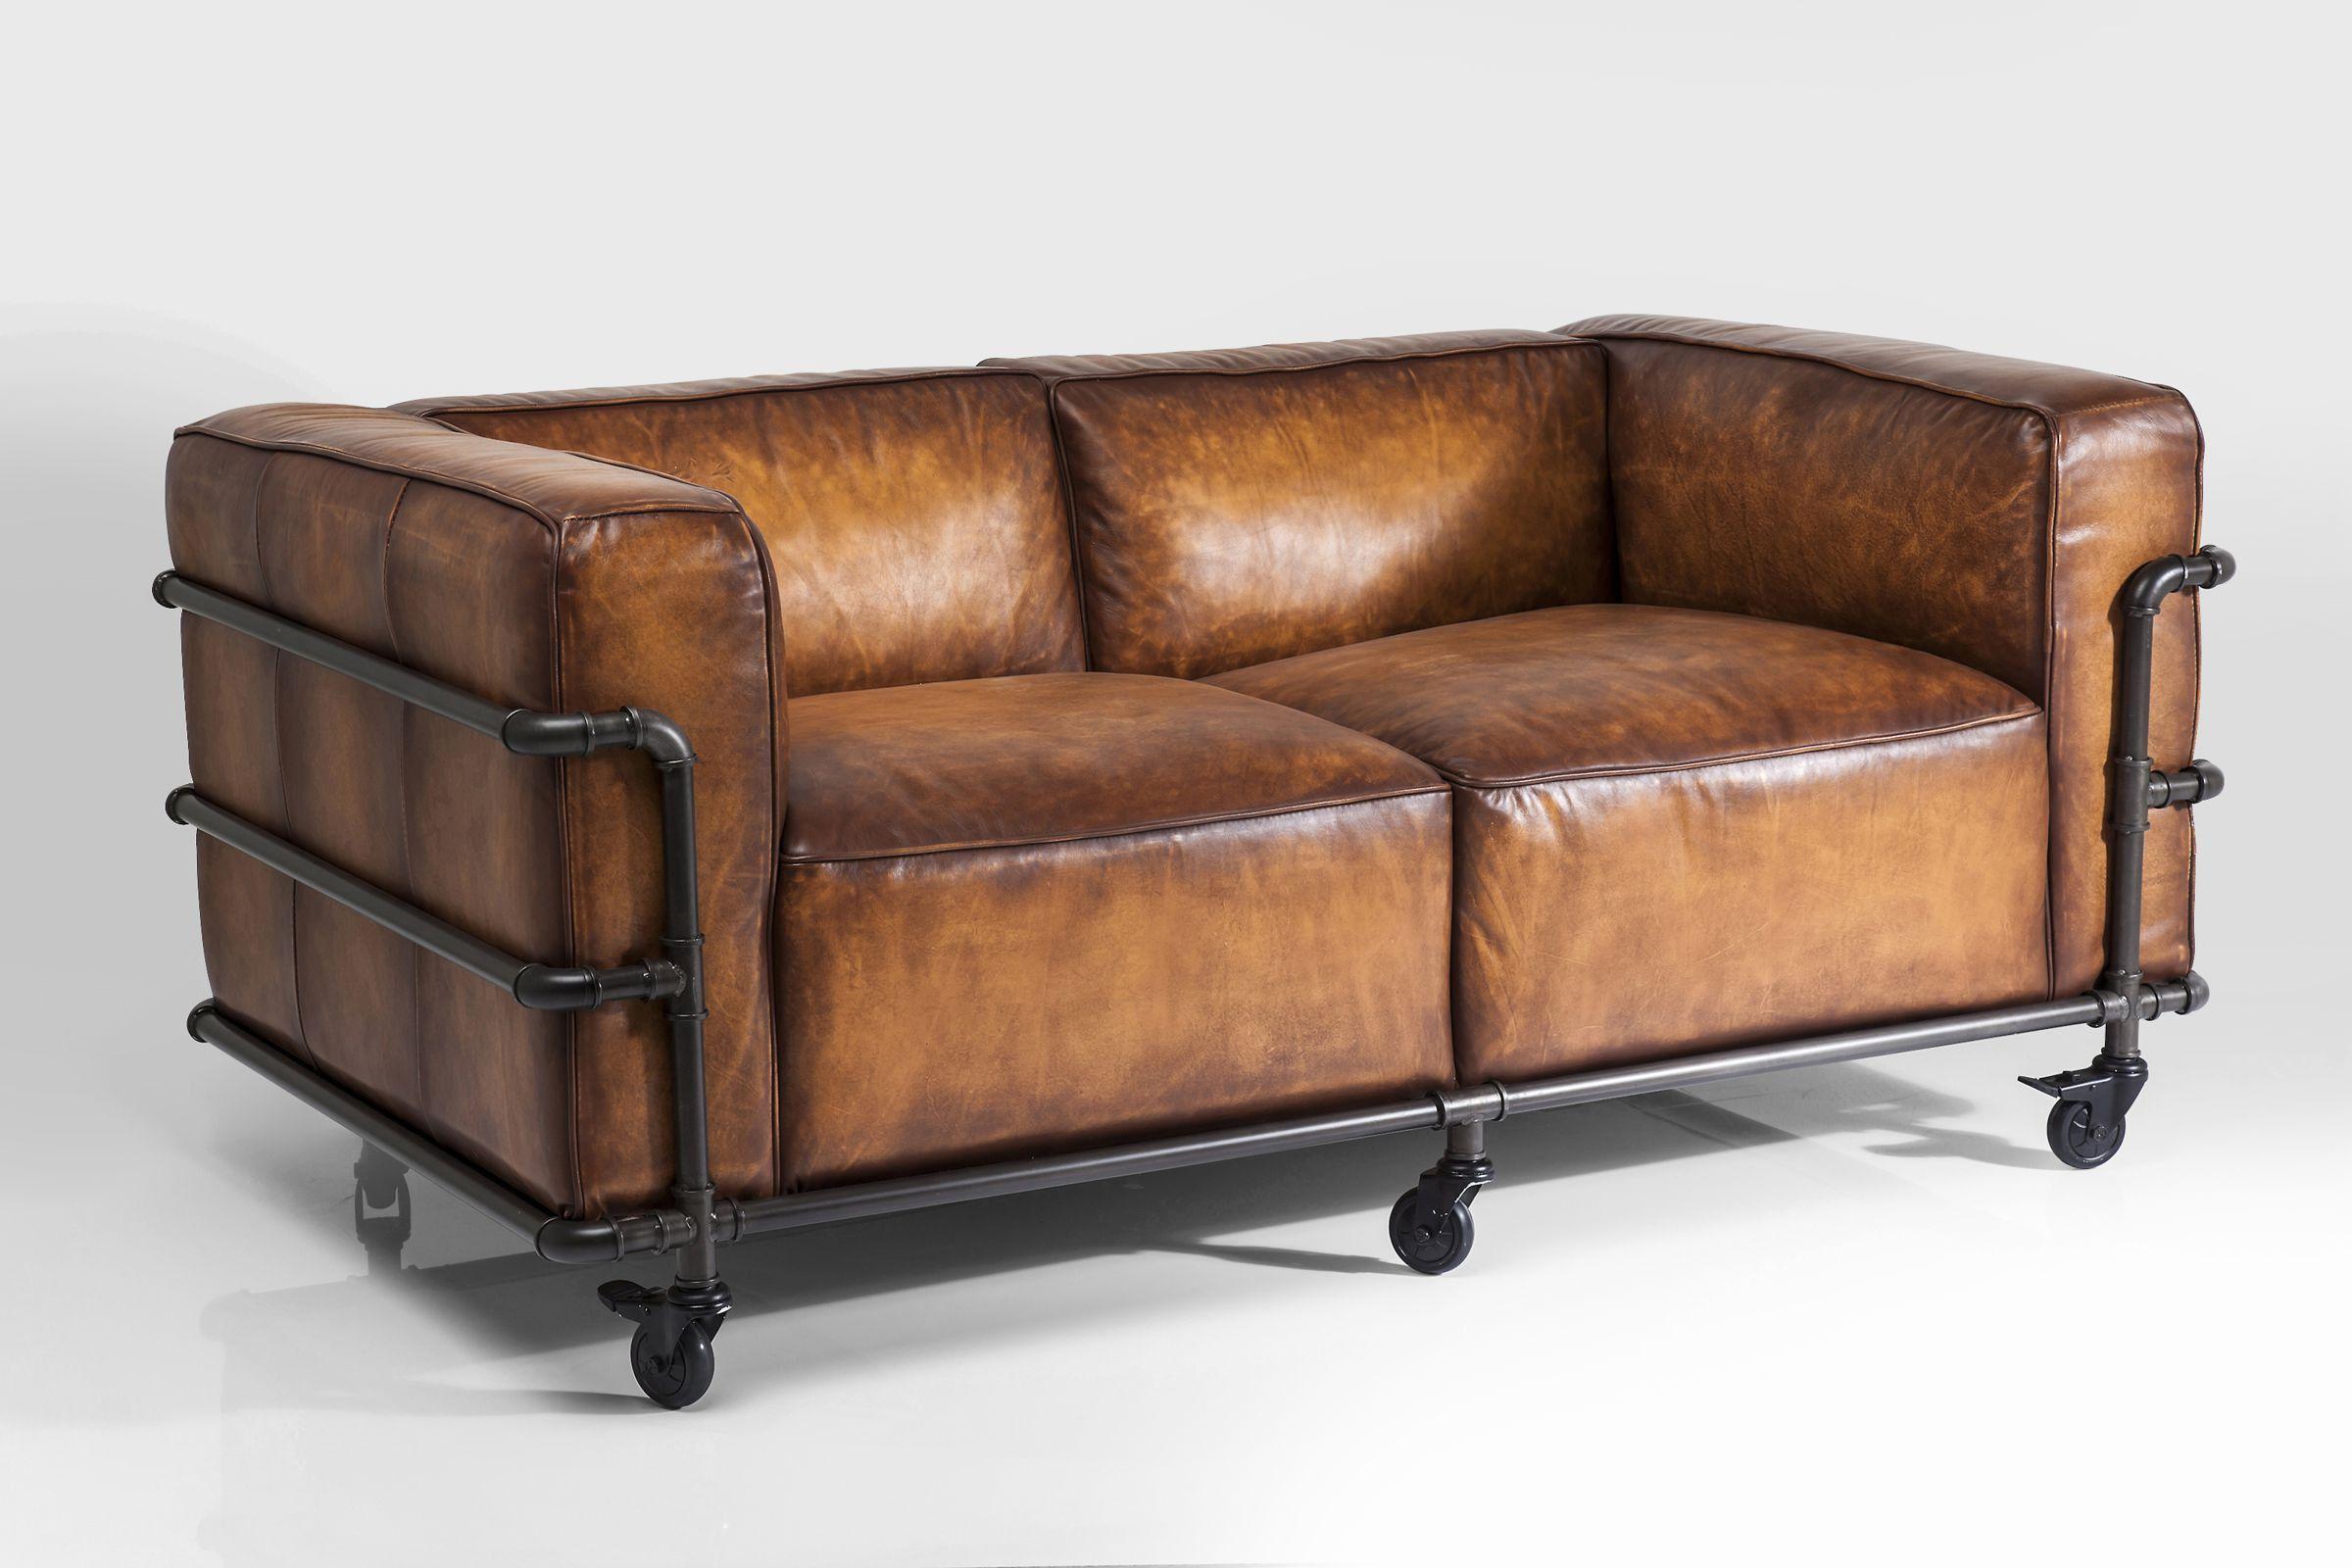 Full Size of Kare Sofa Dschinn Leder Couch Bed 2 Sitzer Quattro 169cm By Design 3 Mit Relaxfunktion L Form Polyrattan Stoff Grau Polster Boxspring Weiß Günstig Kaufen Sofa Kare Sofa